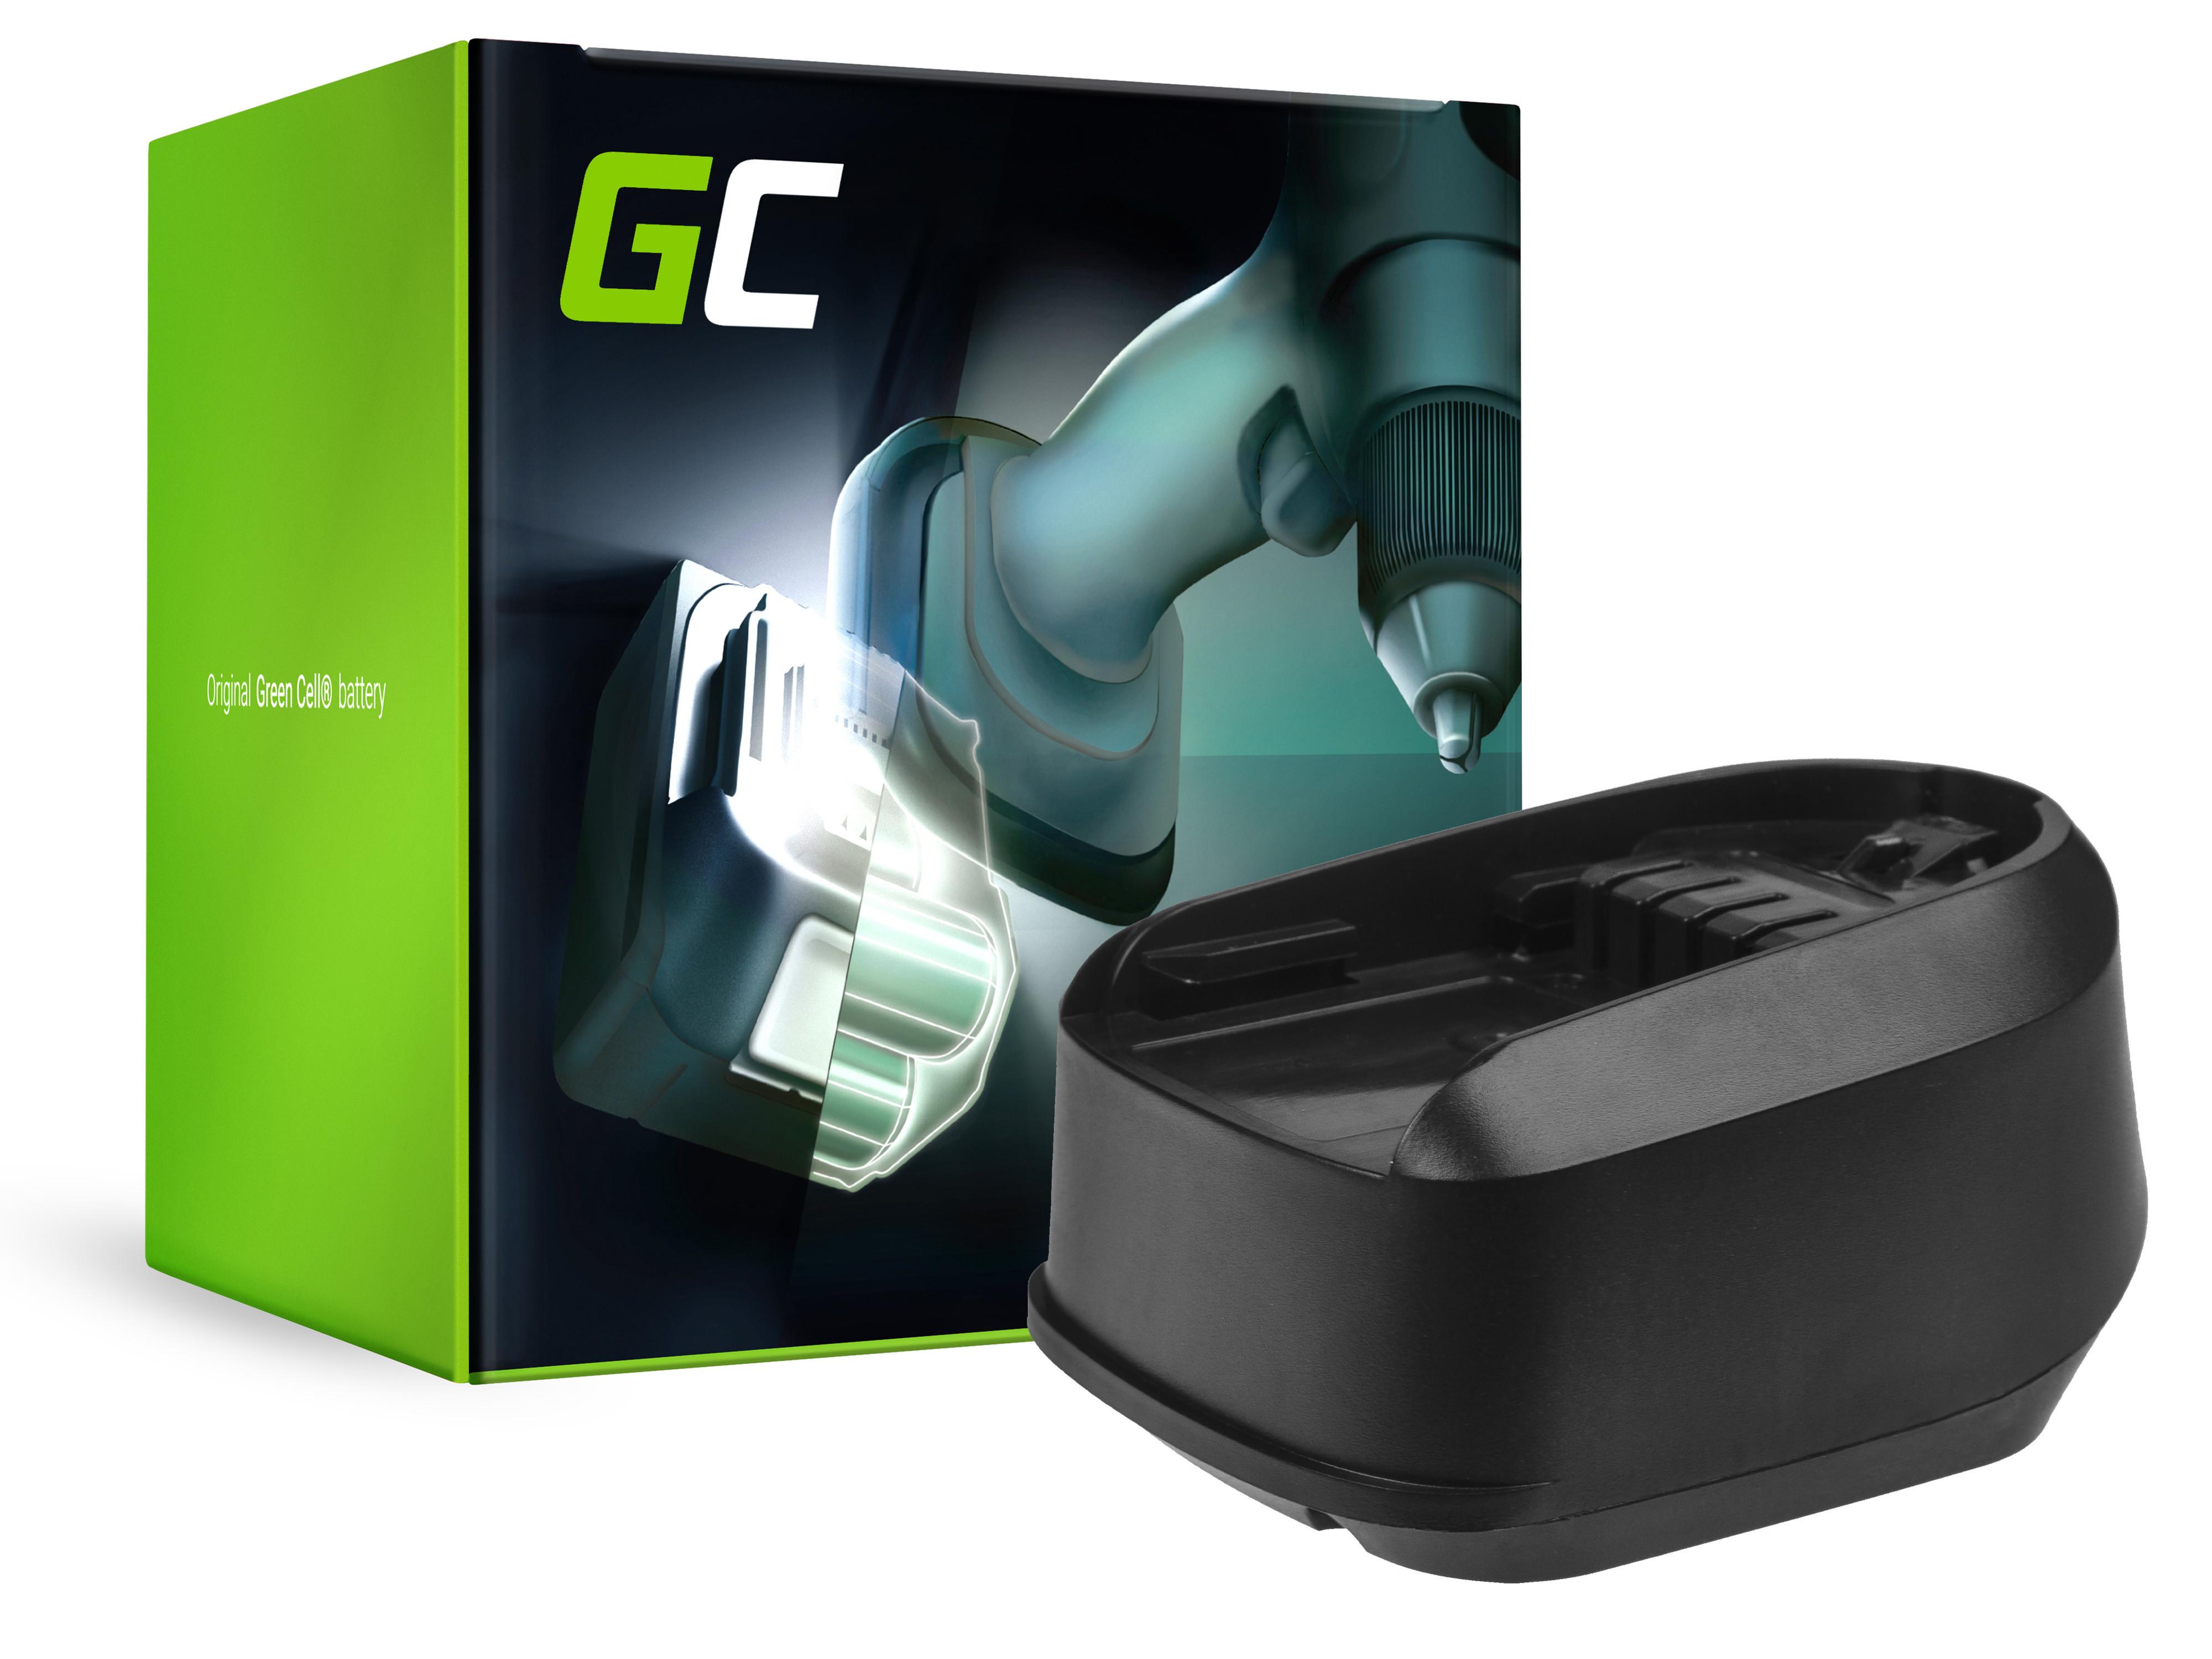 Green Cell ® Power Tool Battery for Bosch PSB PSR PST 18 LI-2 18V 2.5Ah